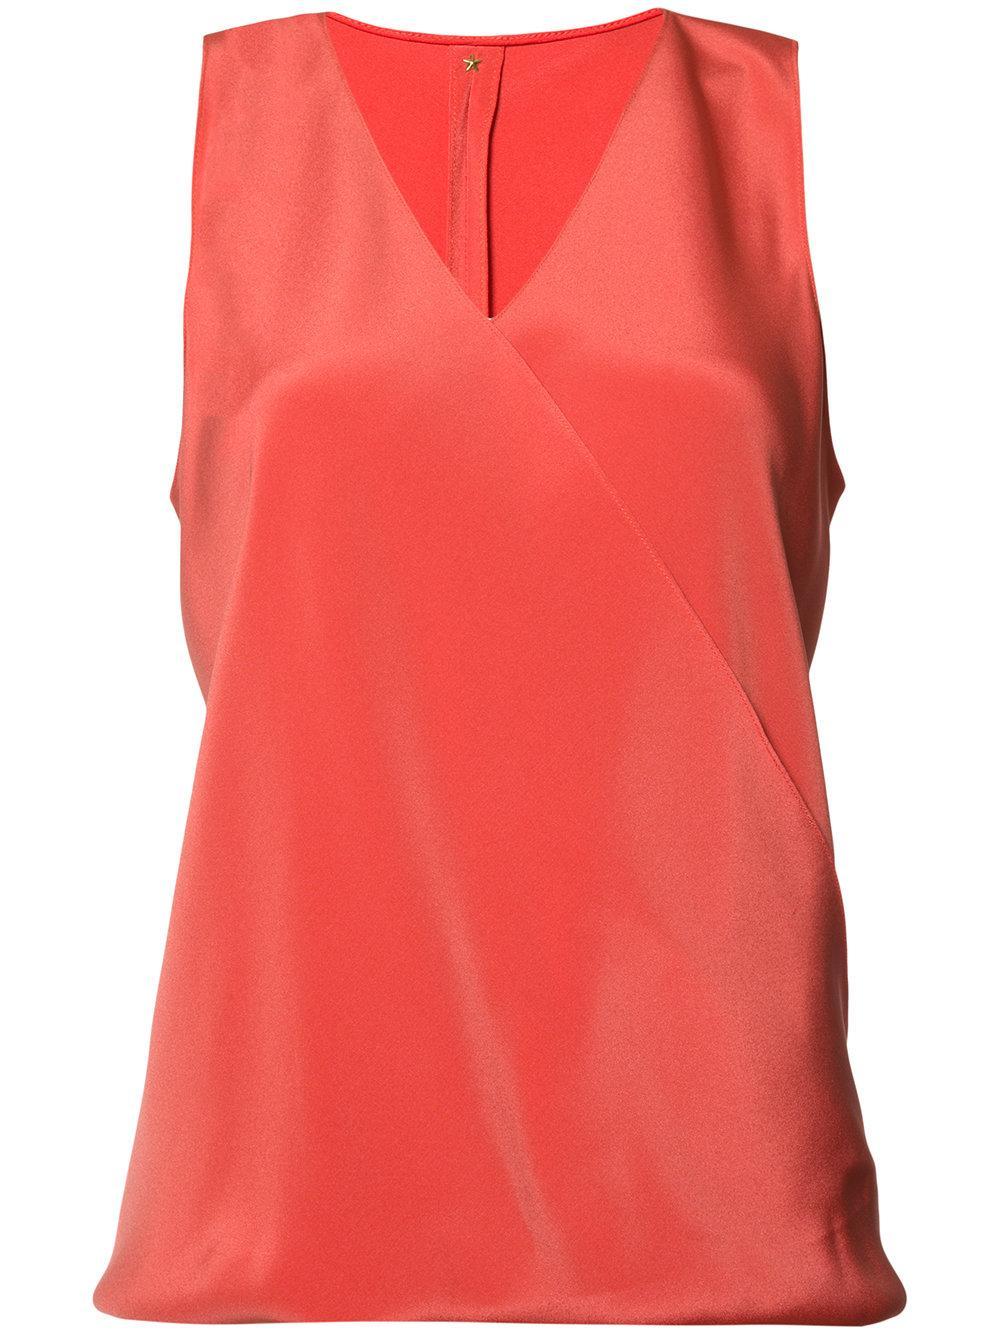 Peter cohen clothing online